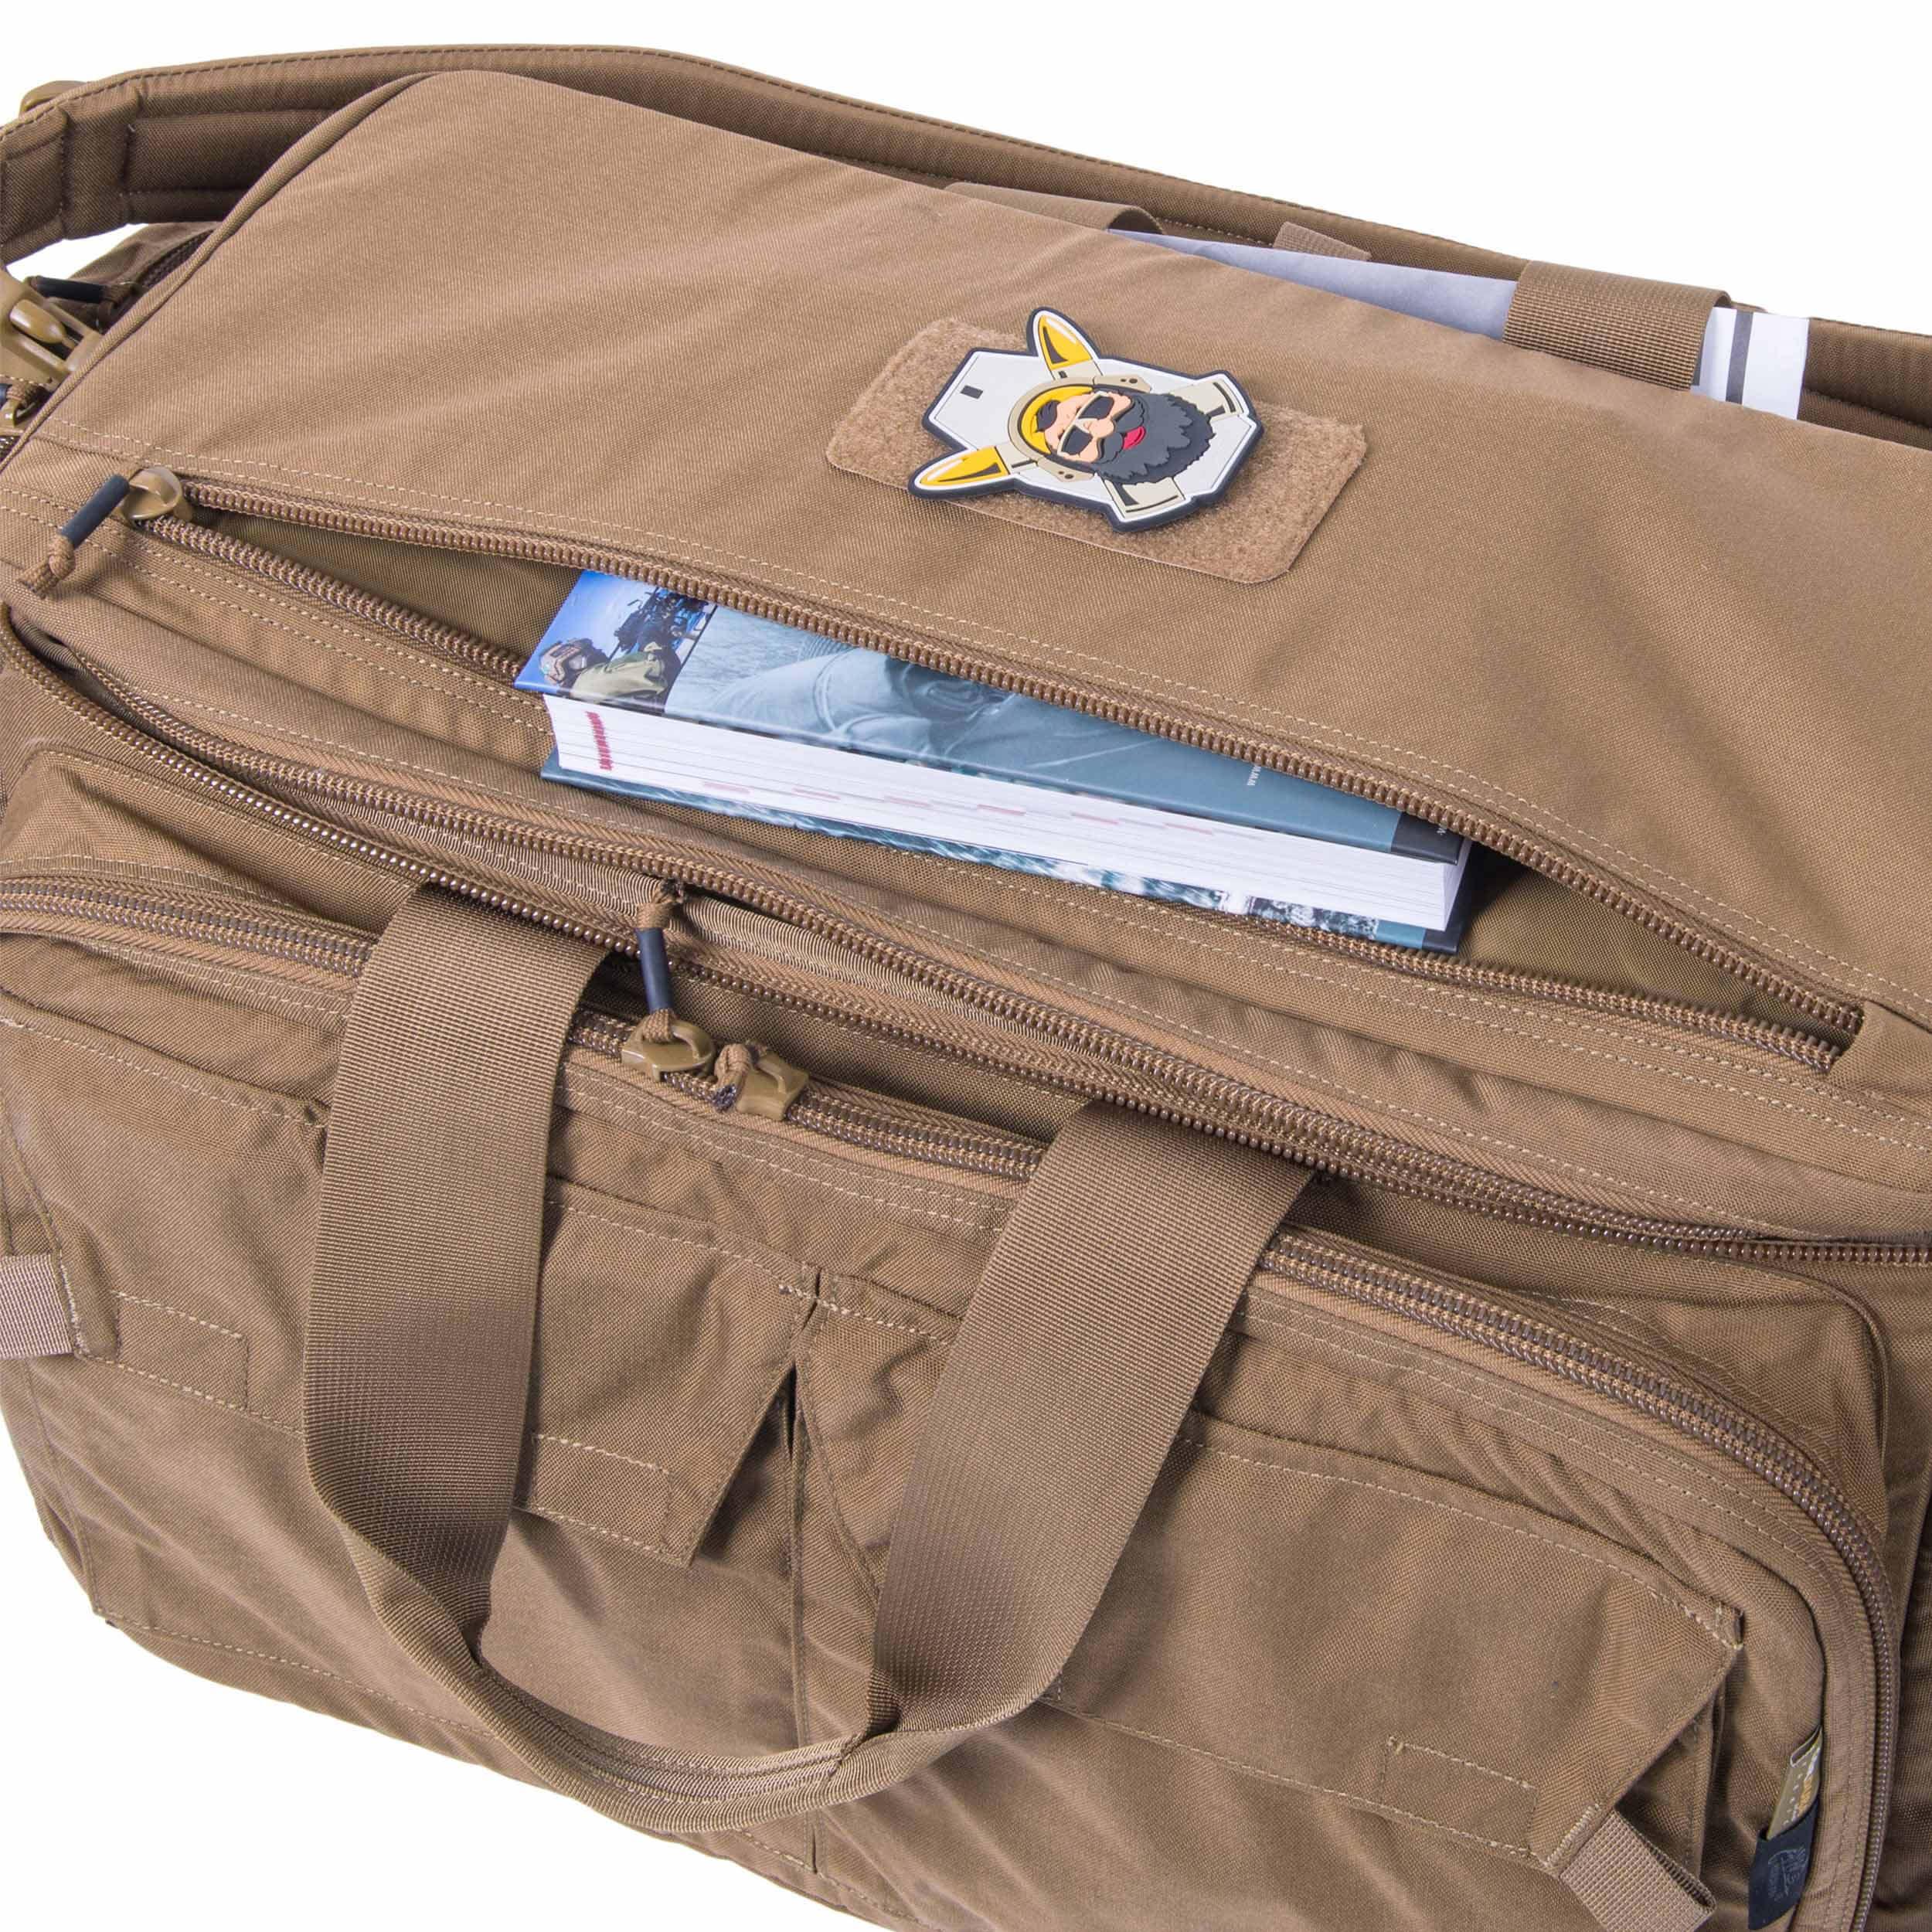 Helikon-Tex RANGEMASTER Gear Bag -Cordura- Multicam